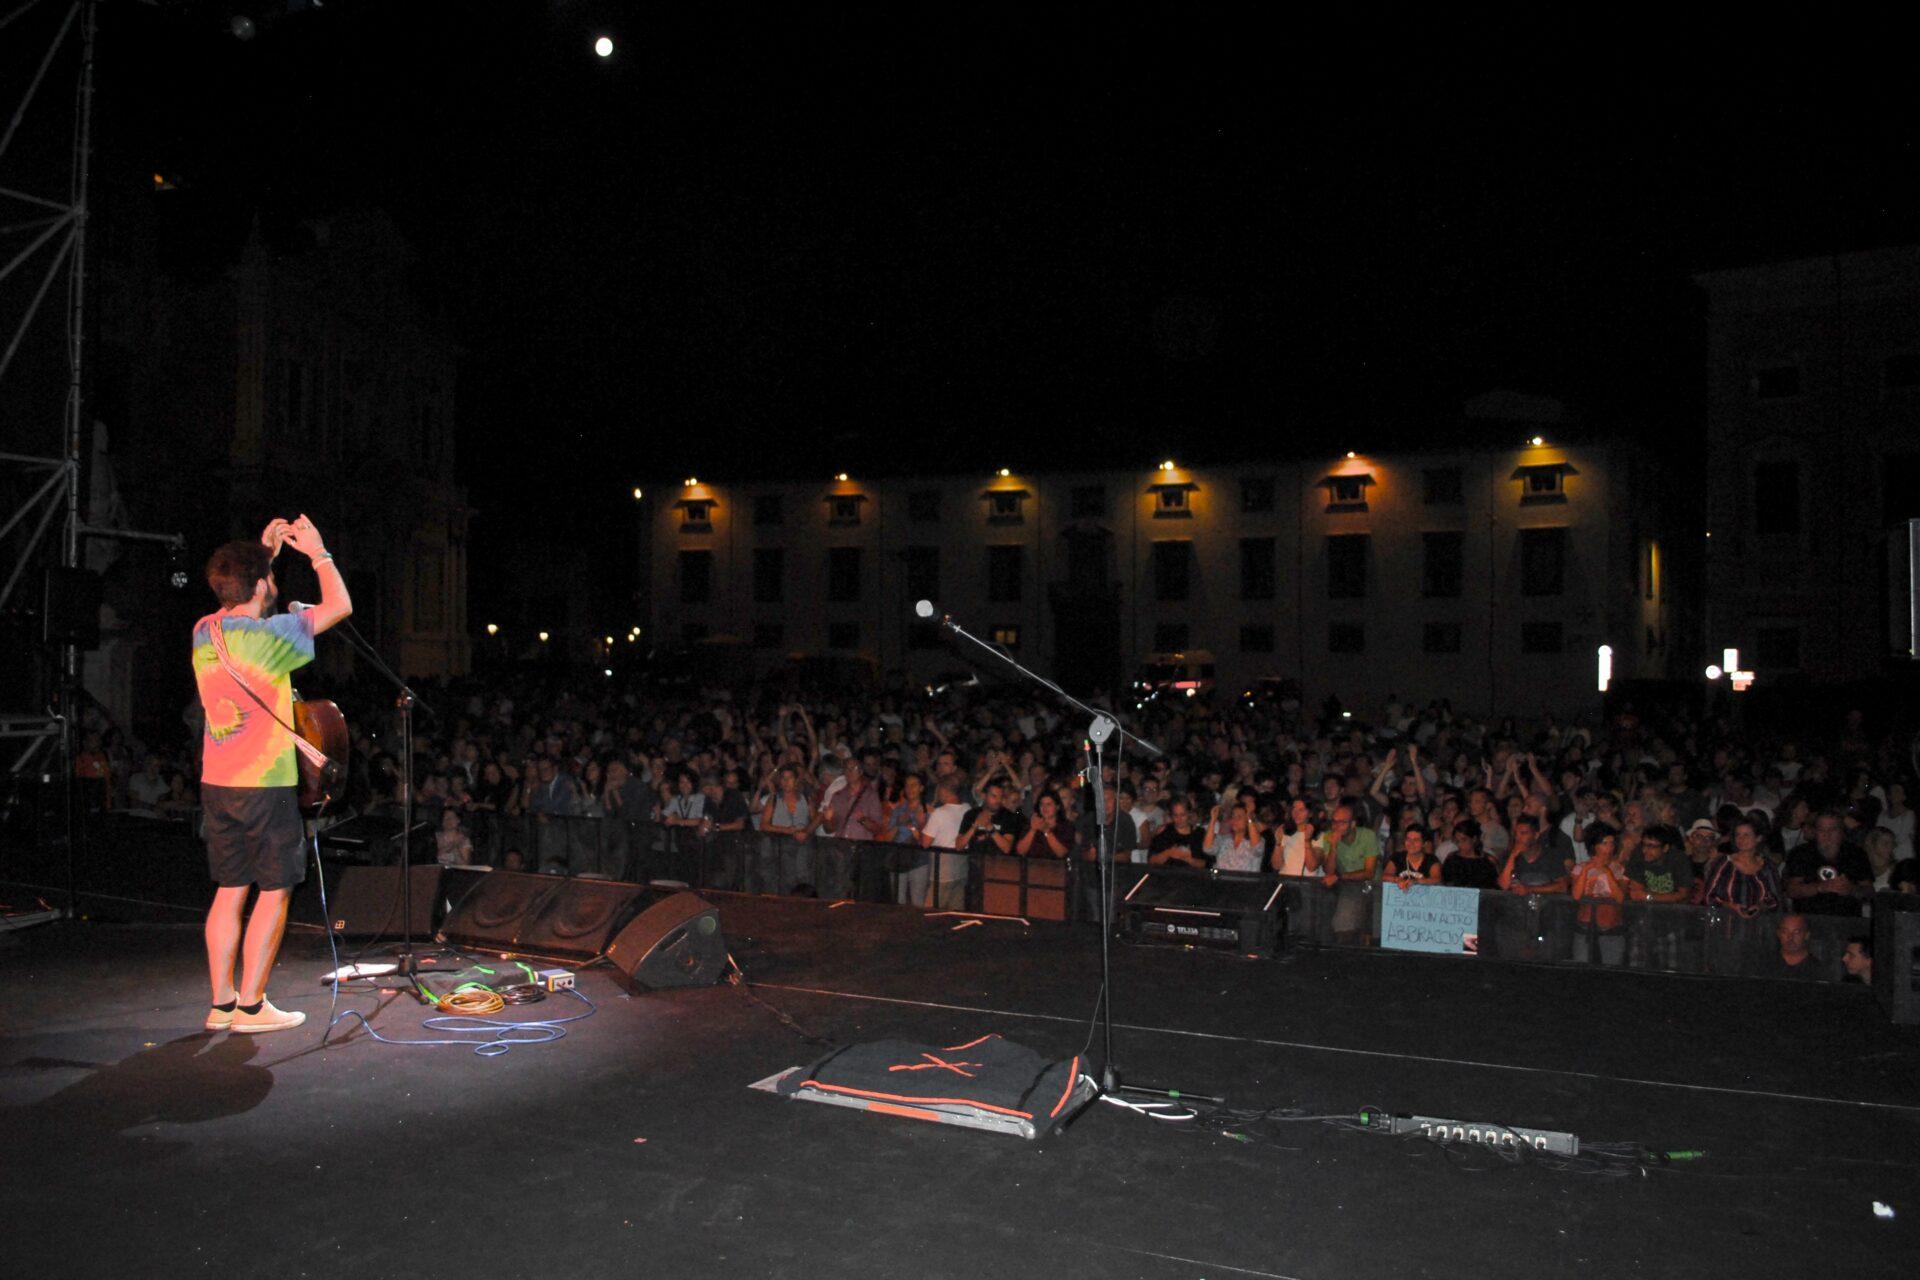 http://andreabrunini.com/wp-content/uploads/2019/09/Piazza-dei-cavalieri-7-1920x1280.jpg